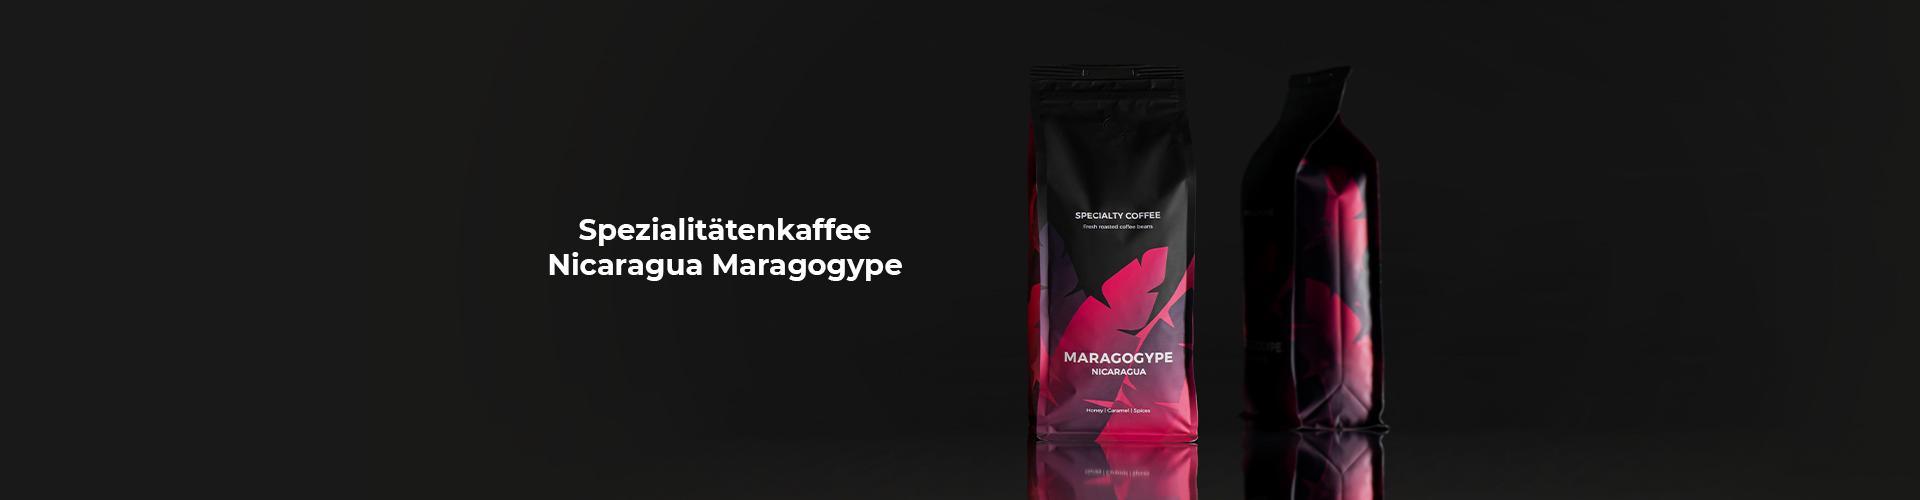 Spezialitätenkaffee Nicaragua Maragogype